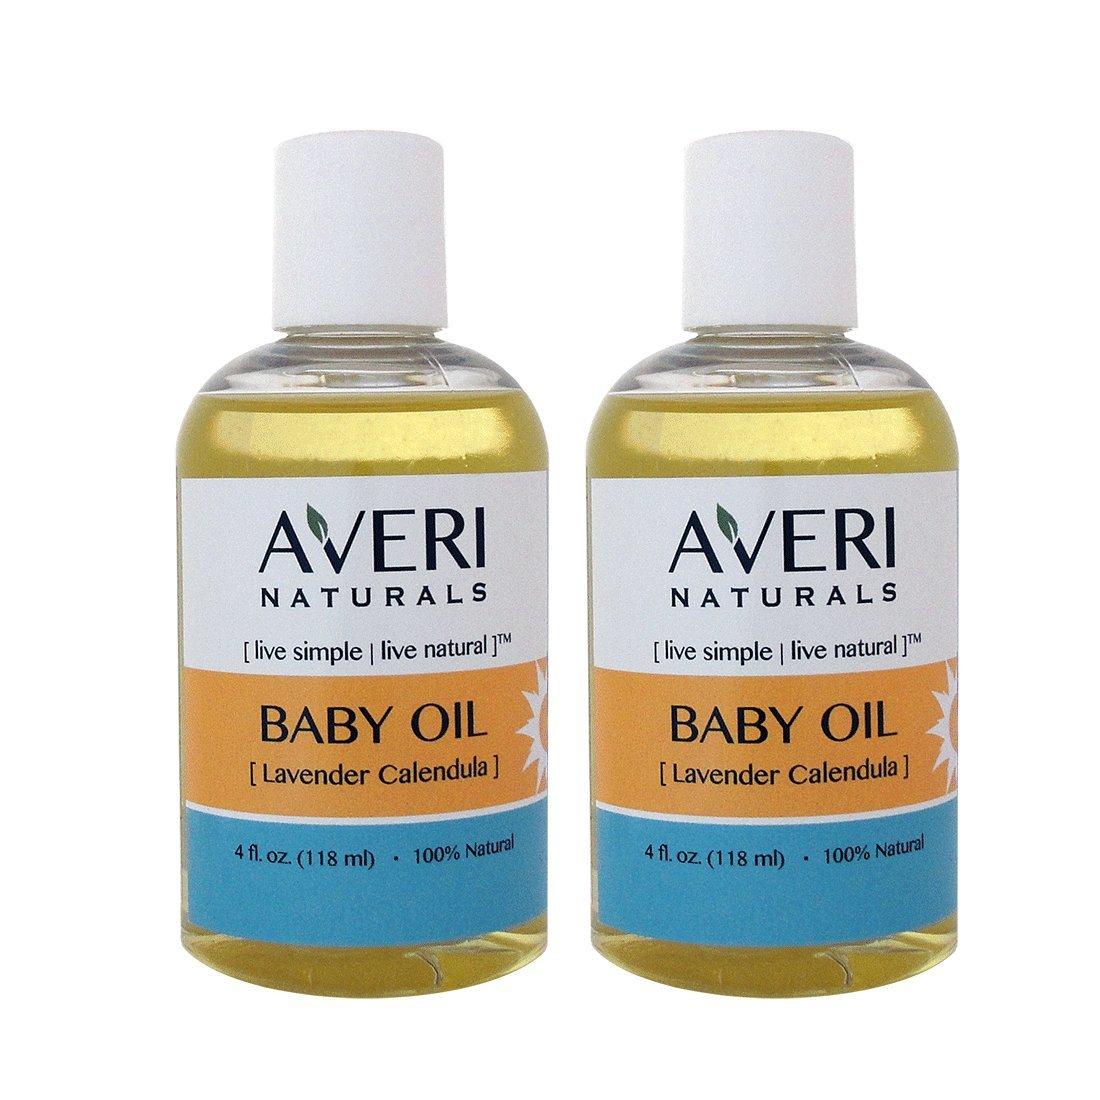 Averi Naturals Calendula Baby Massage Oil • 100% Natural • with Organic Sunflower and Jojoba Oils • 4 oz • FREE SHIPPING (2)